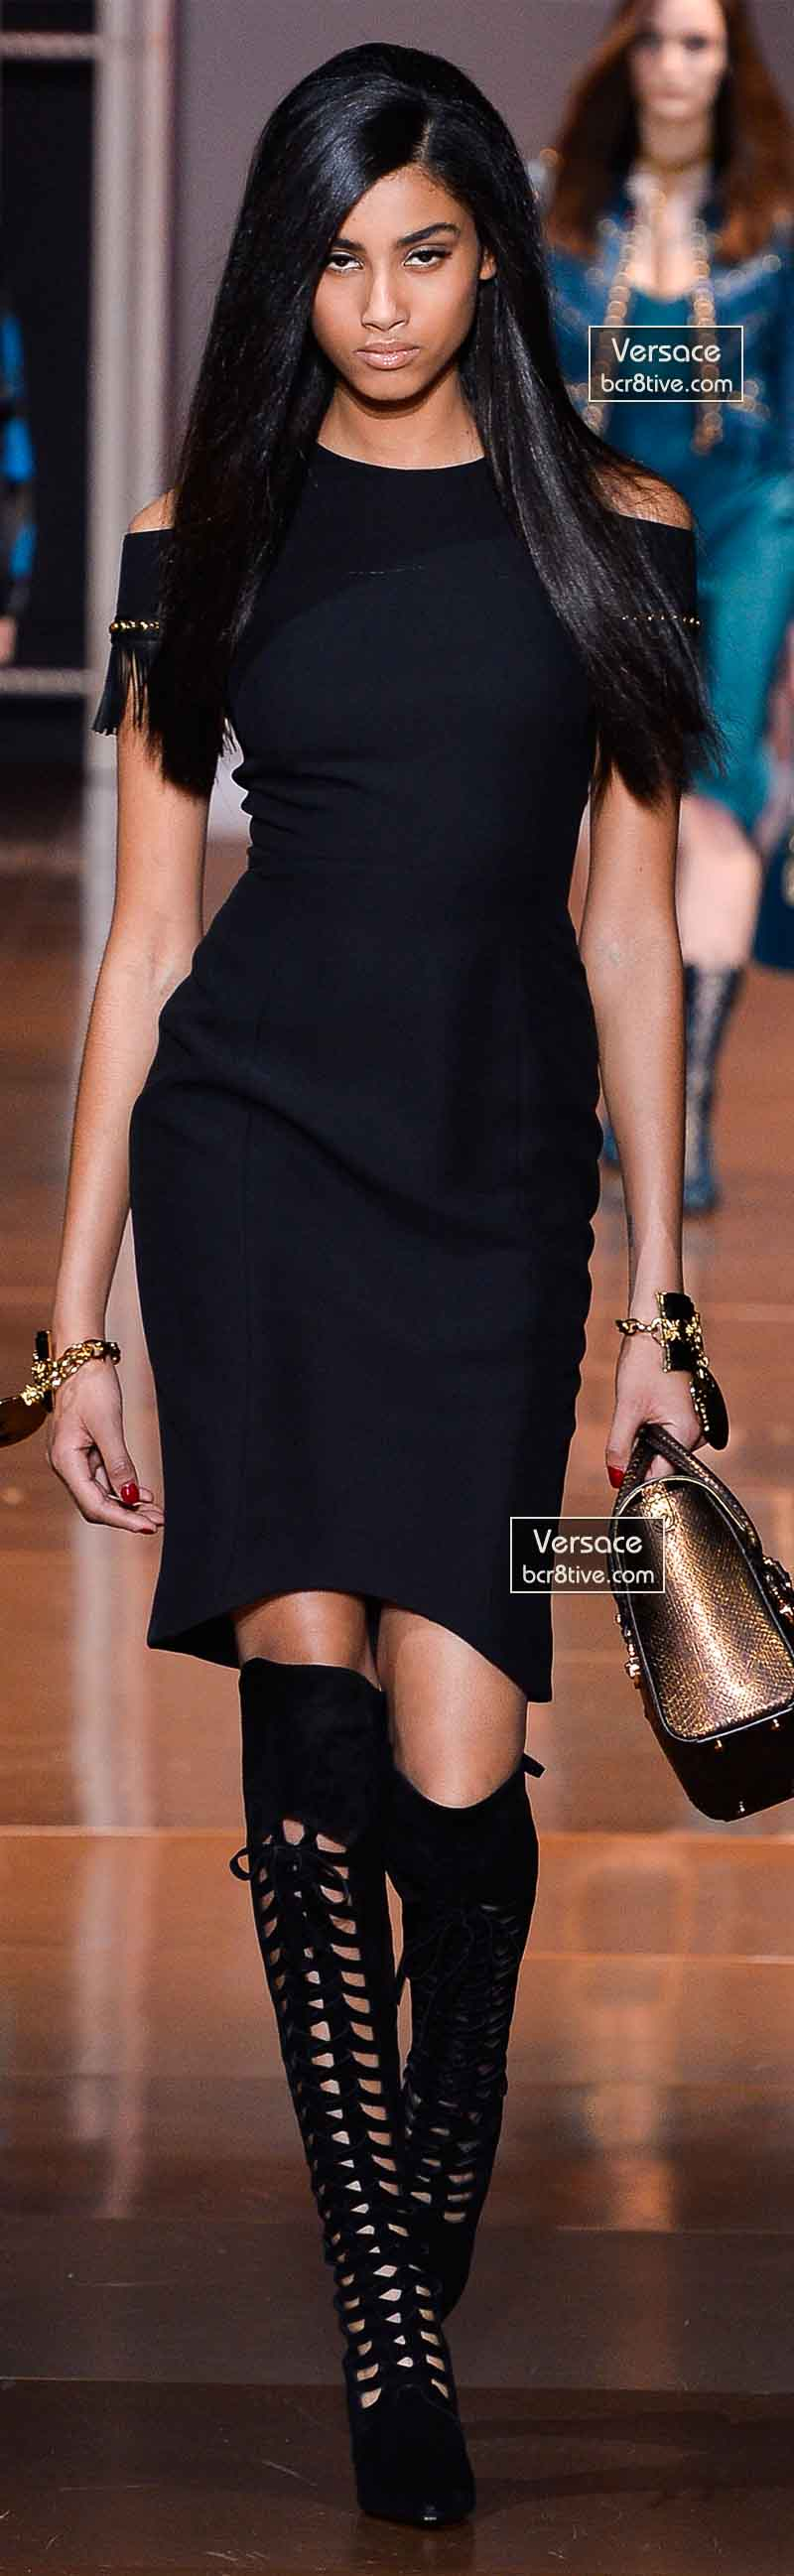 Versace Fall 2014 - Imaan Hammam